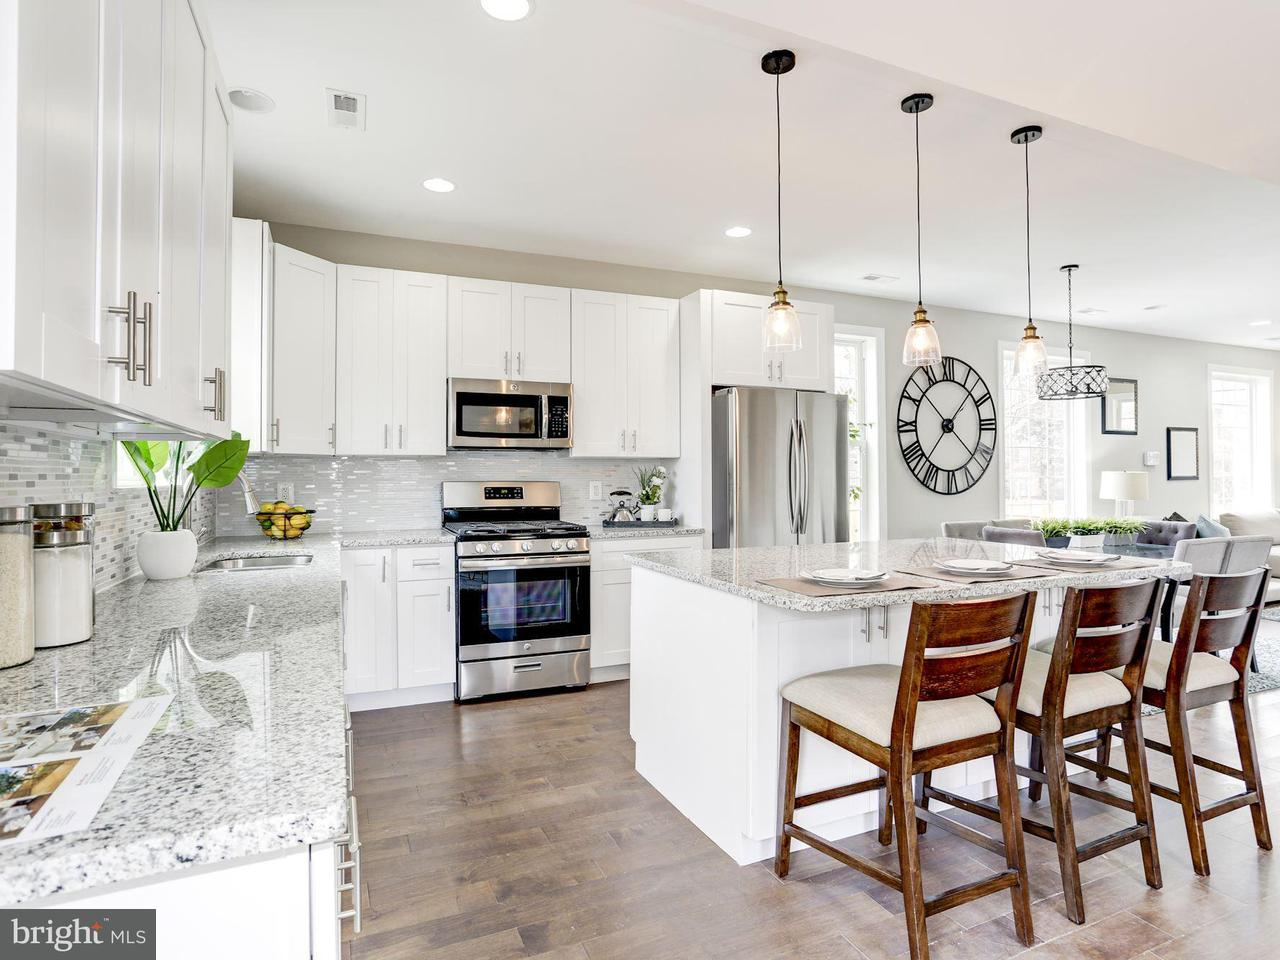 Single Family Home for Sale at 18 Madison St Ne 18 Madison St Ne Washington, District Of Columbia 20011 United States